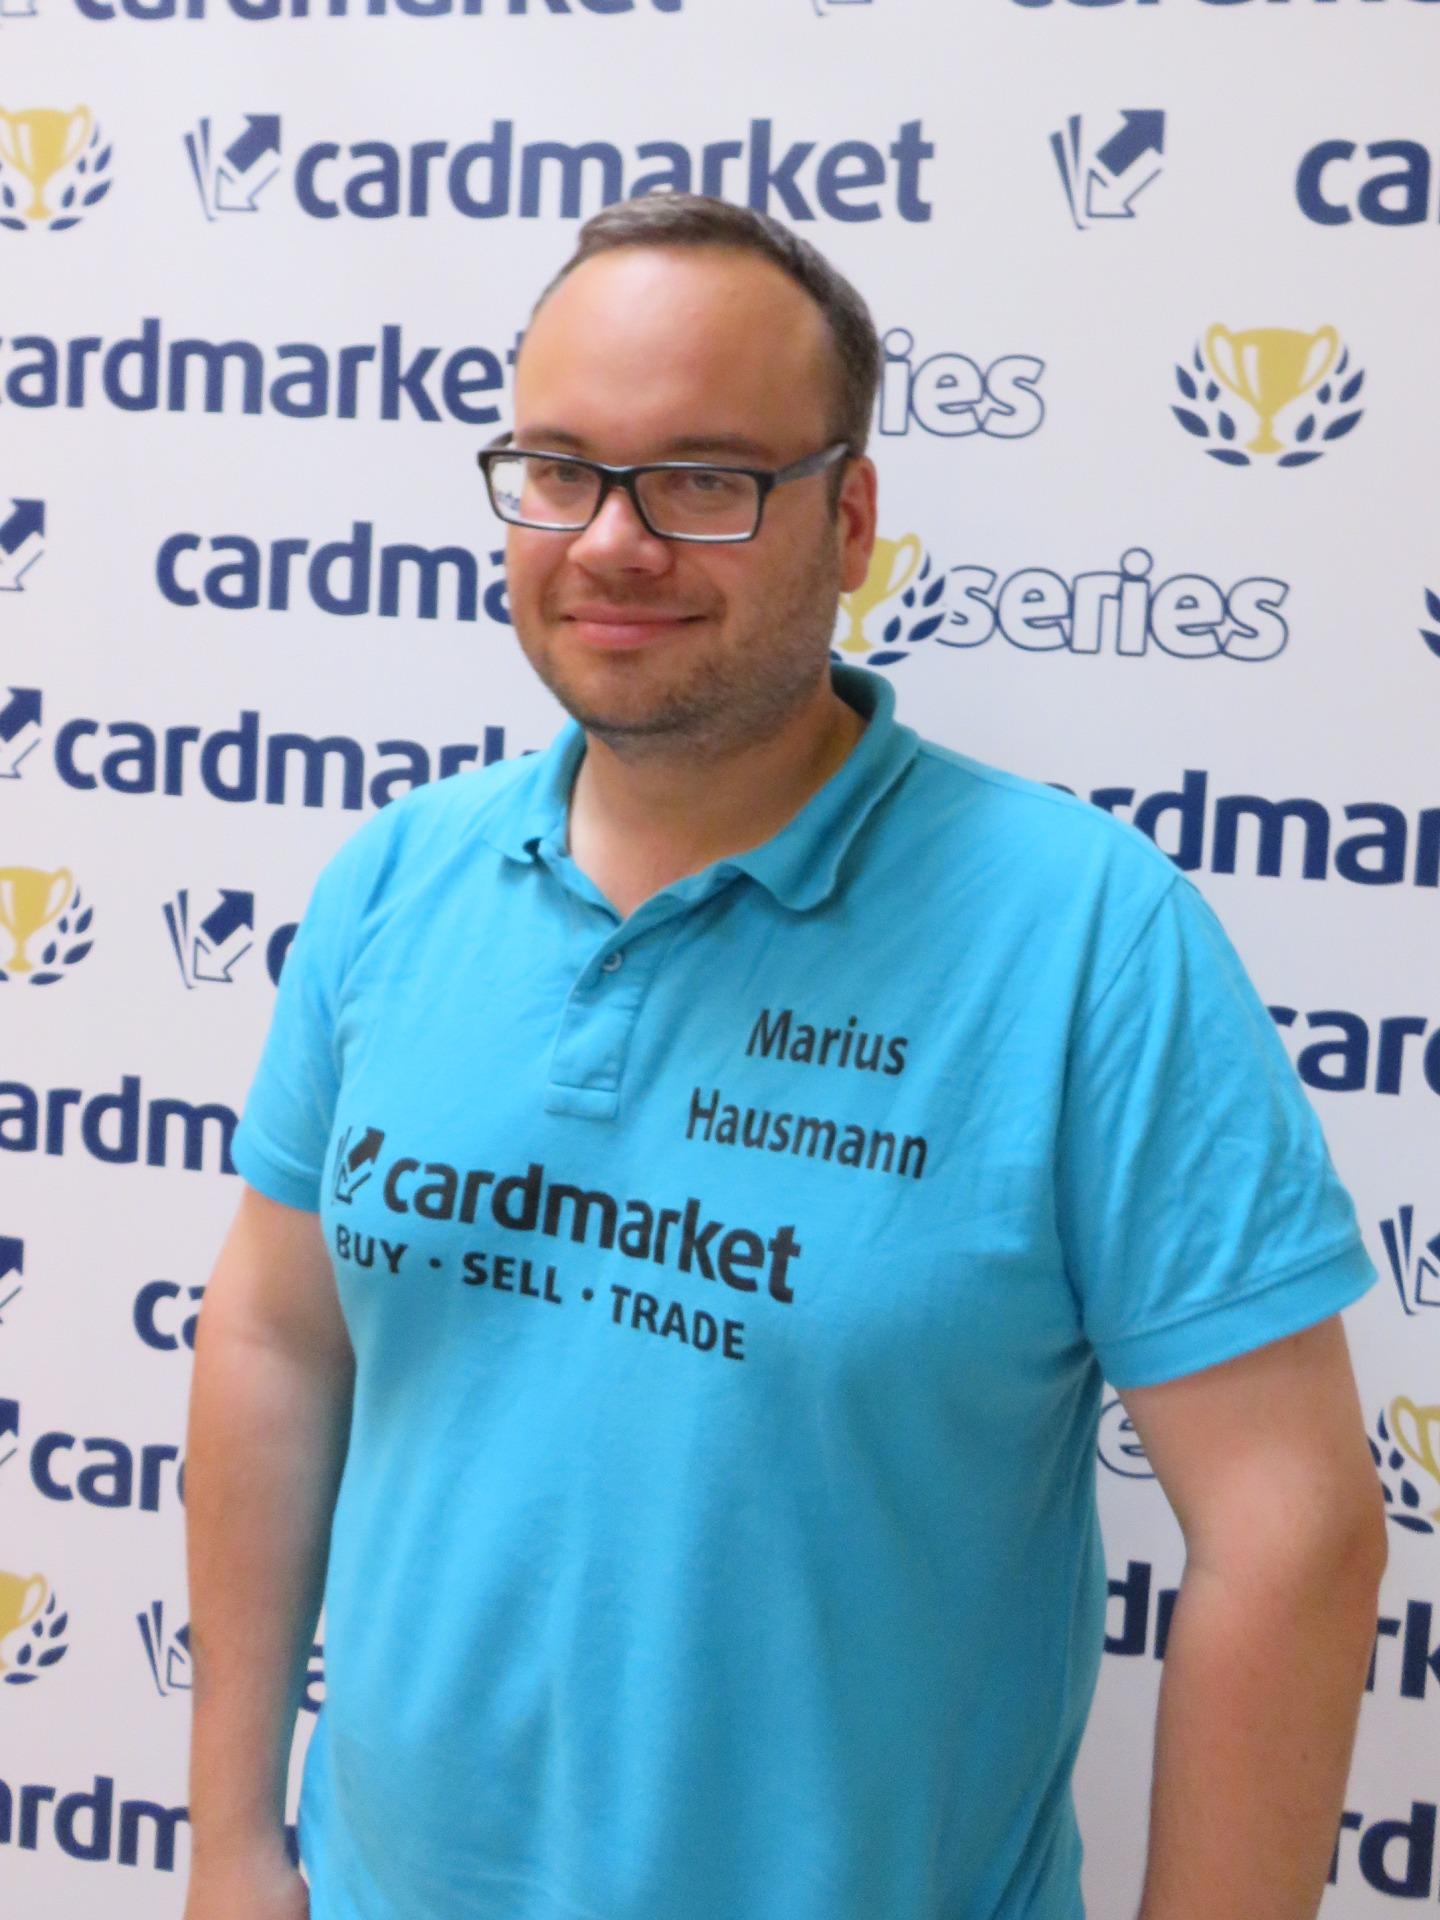 Marius Hausmann